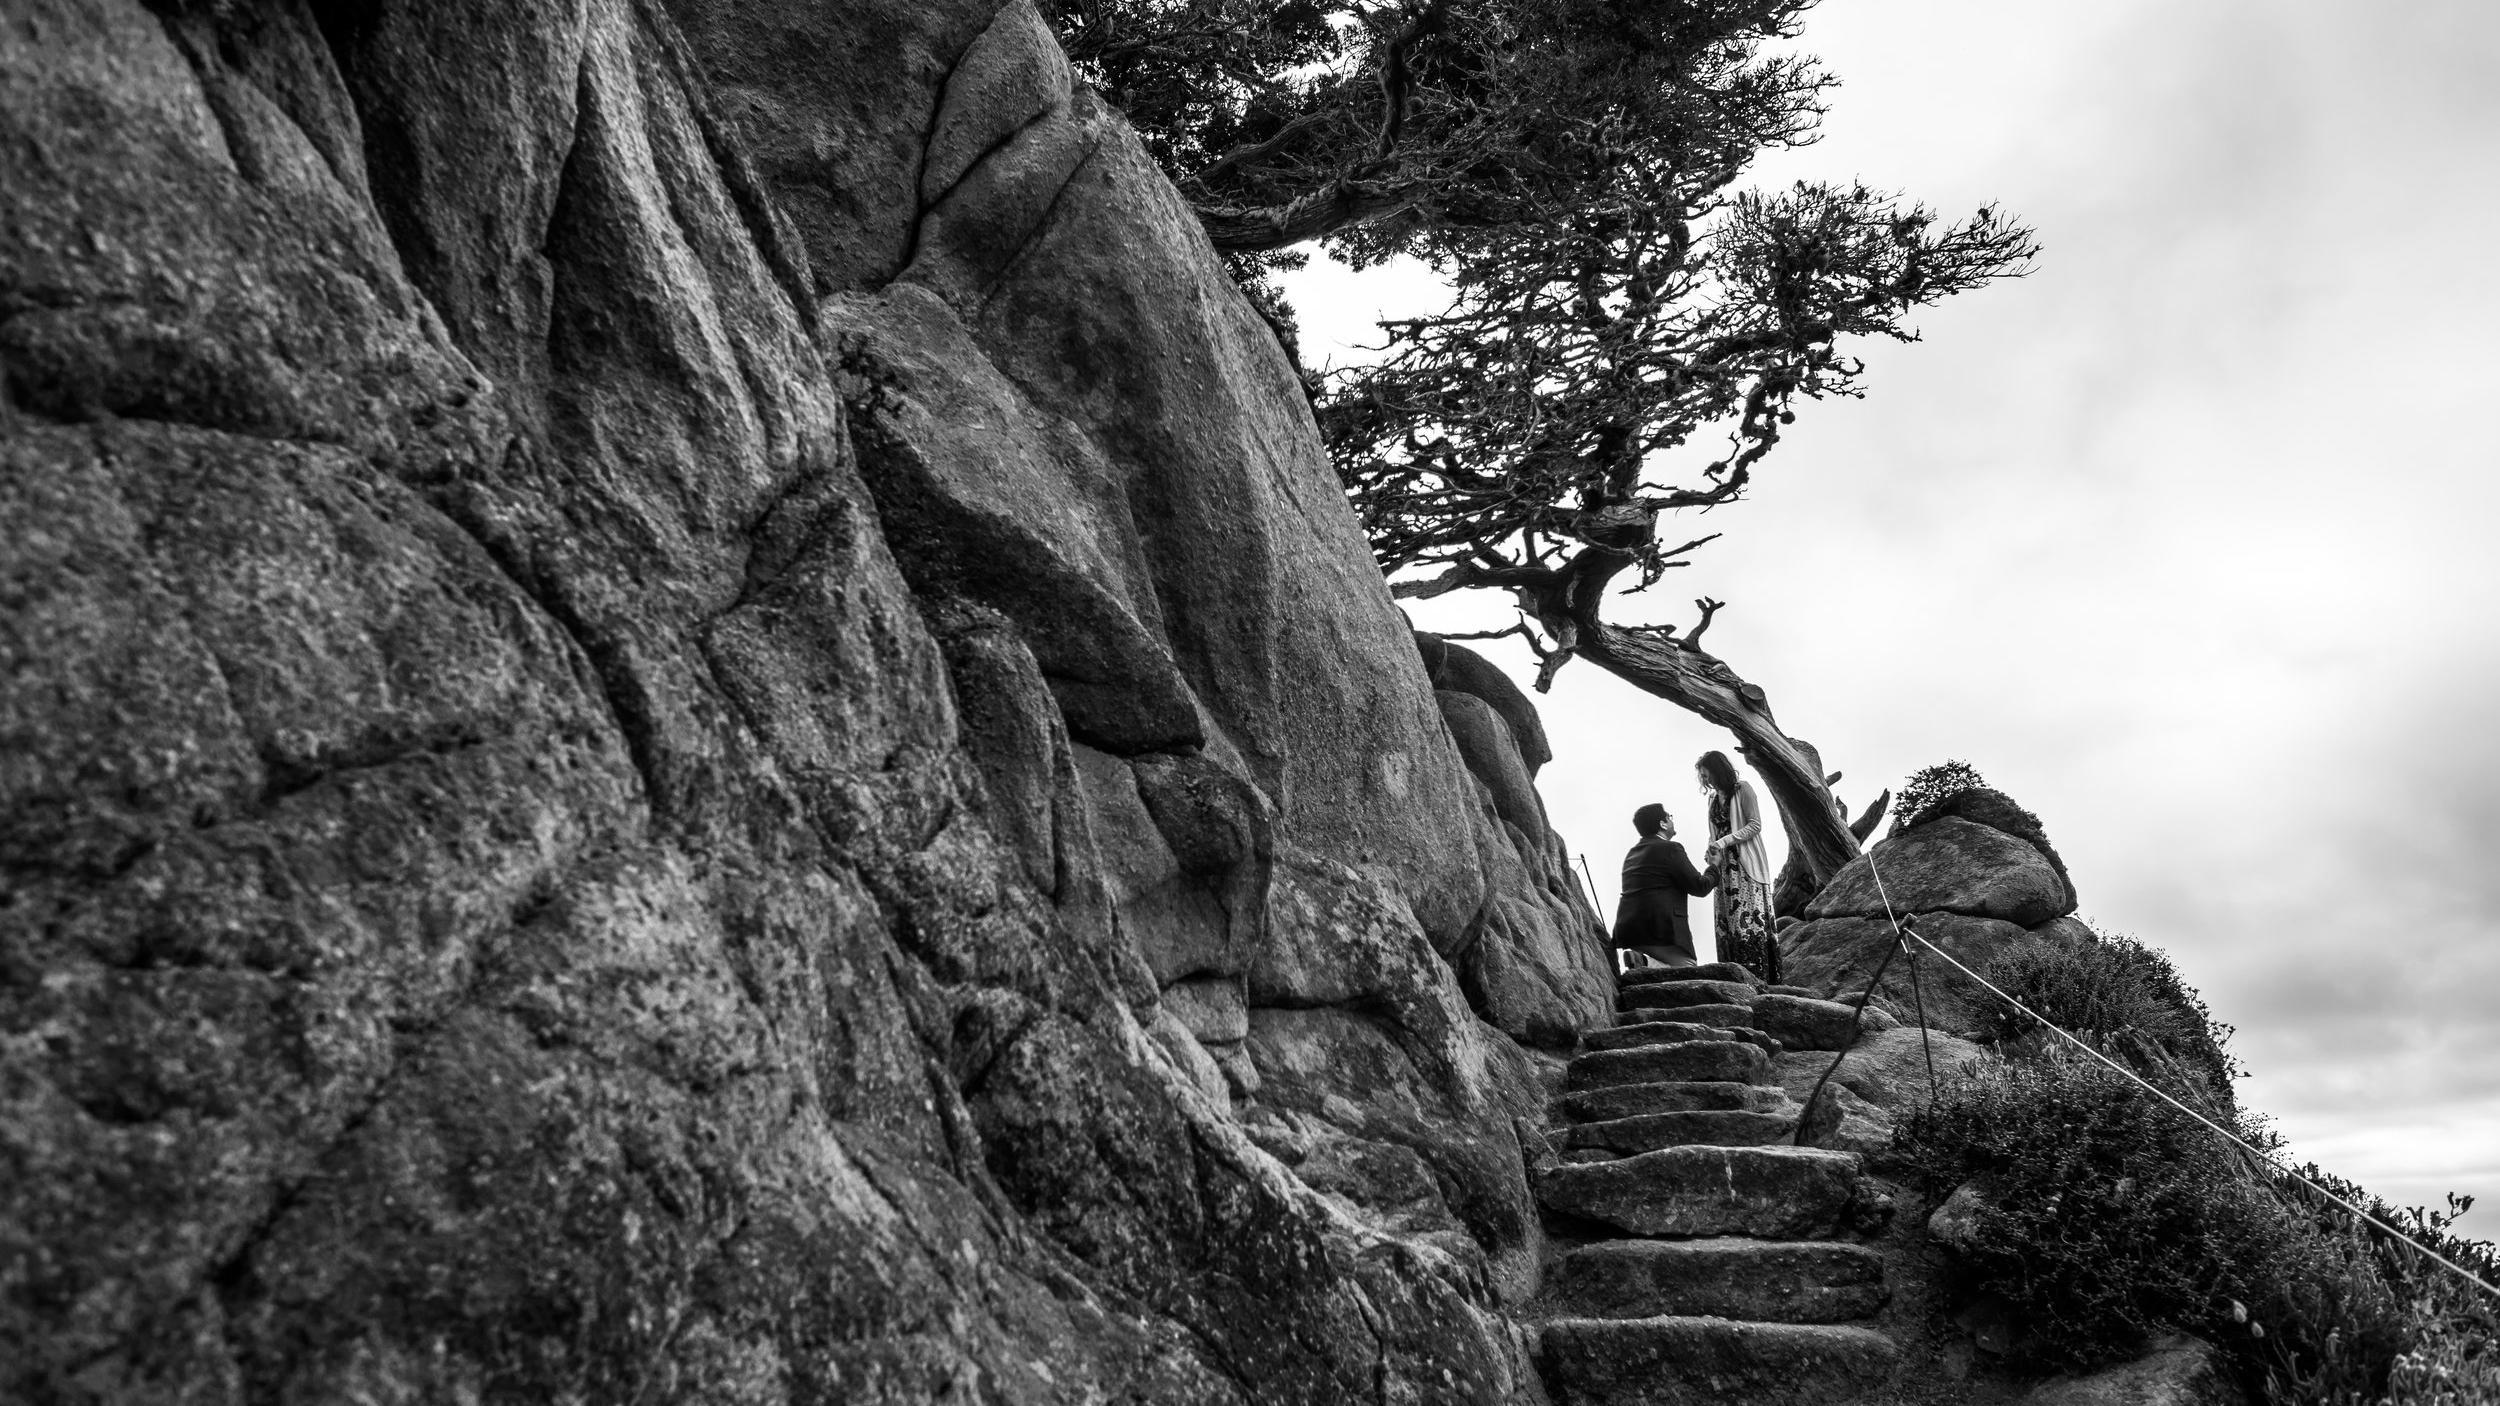 Wedding proposal at Point Lobos in Carmel, California